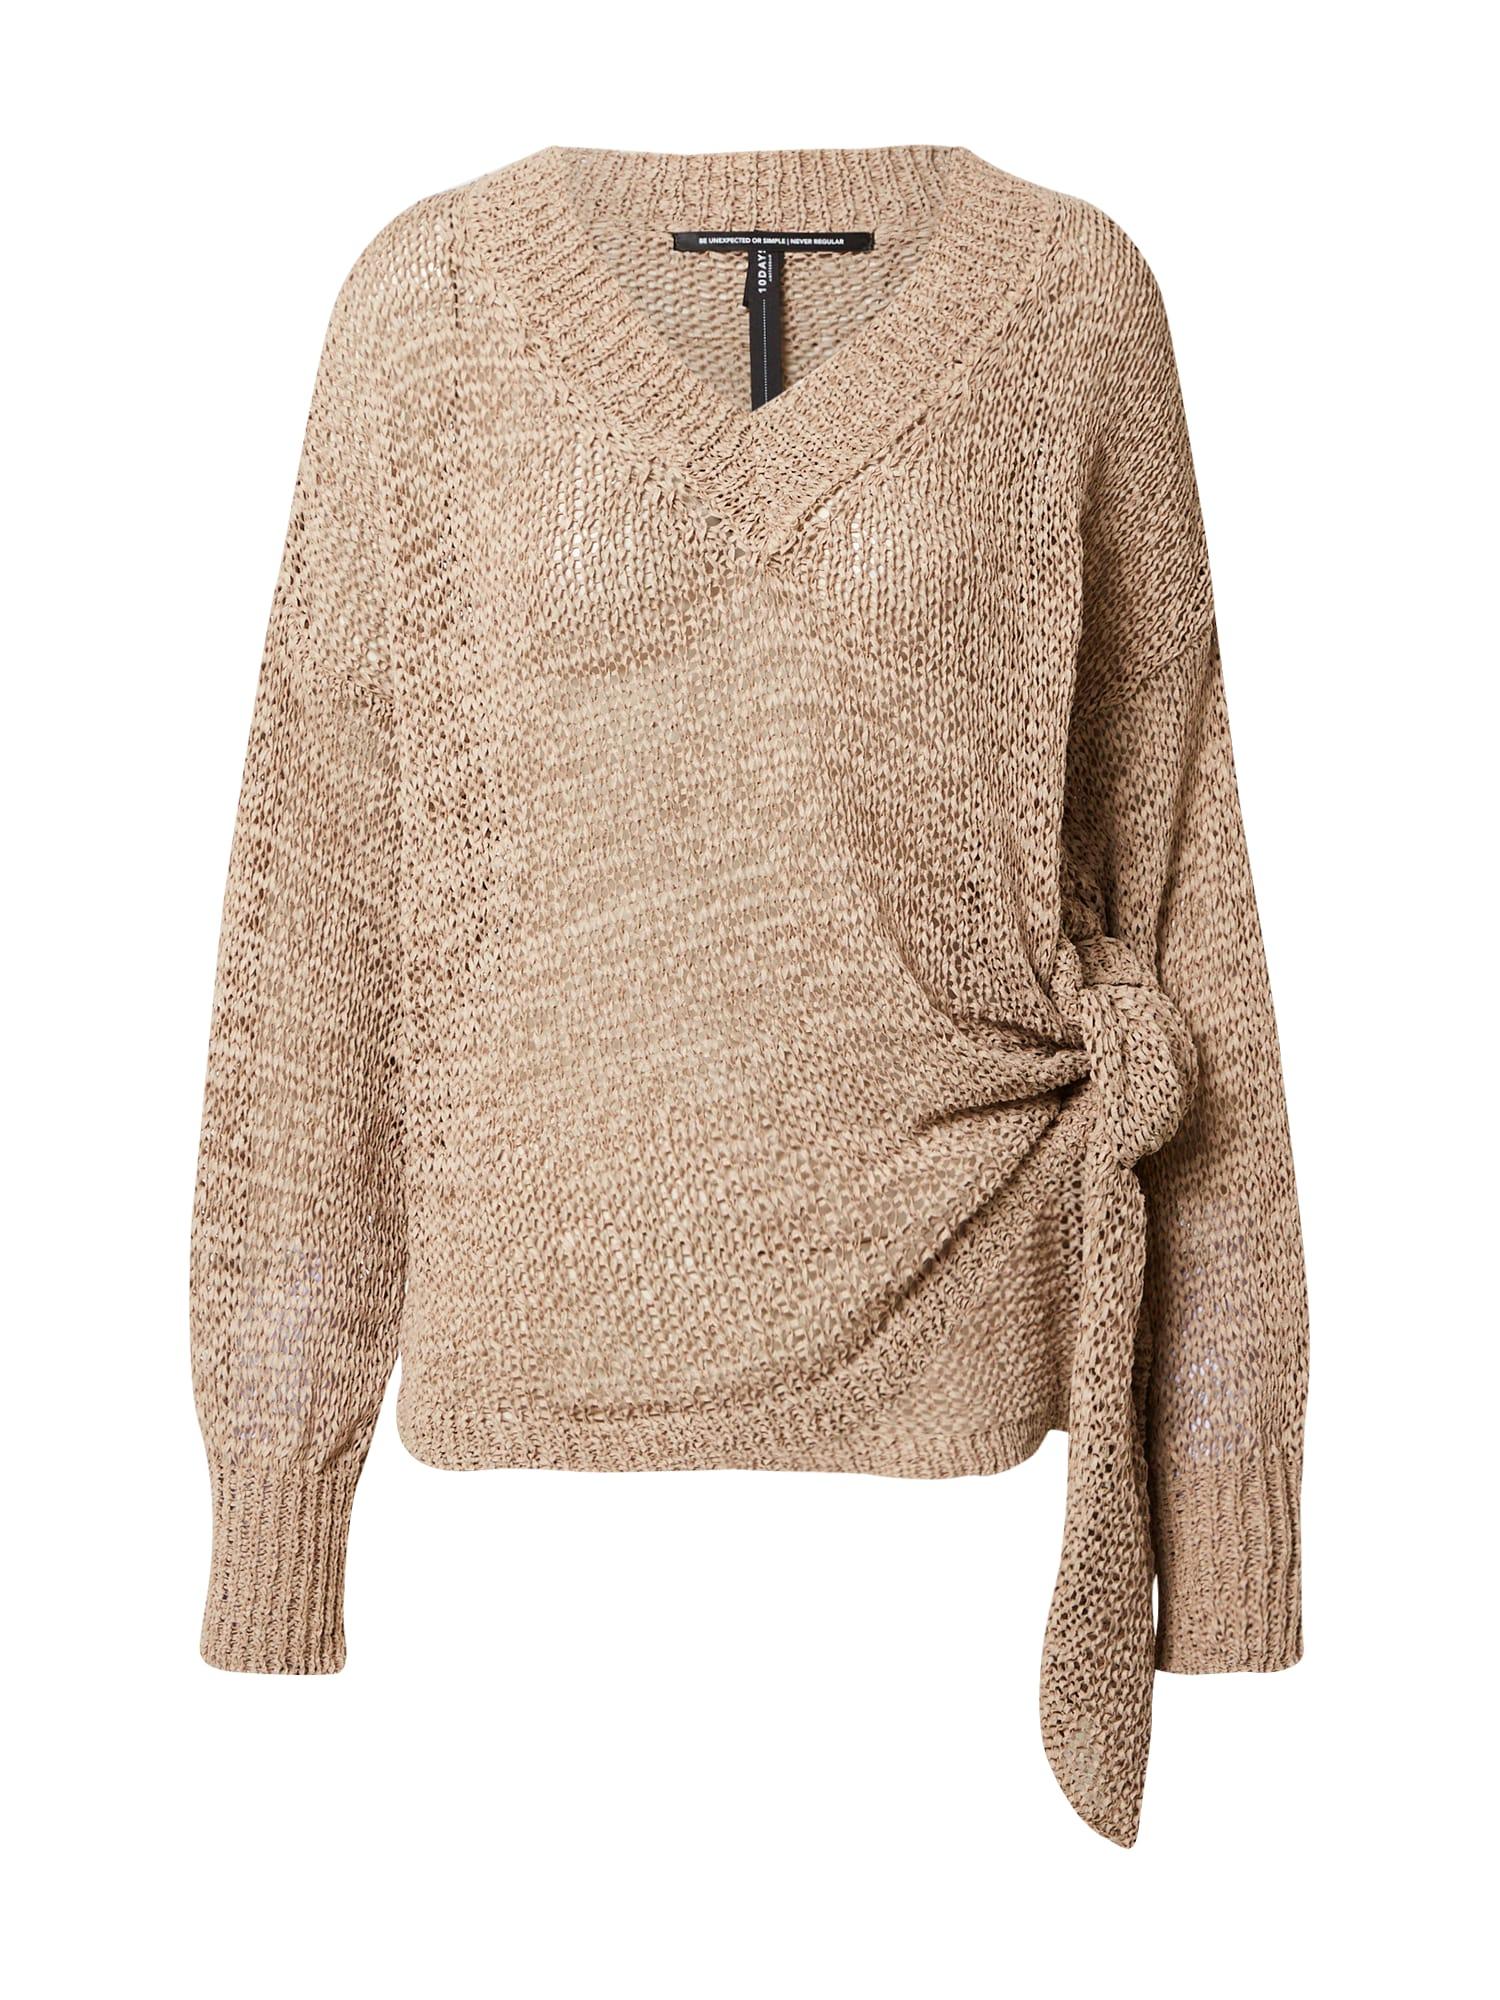 10Days Megztinis kupranugario